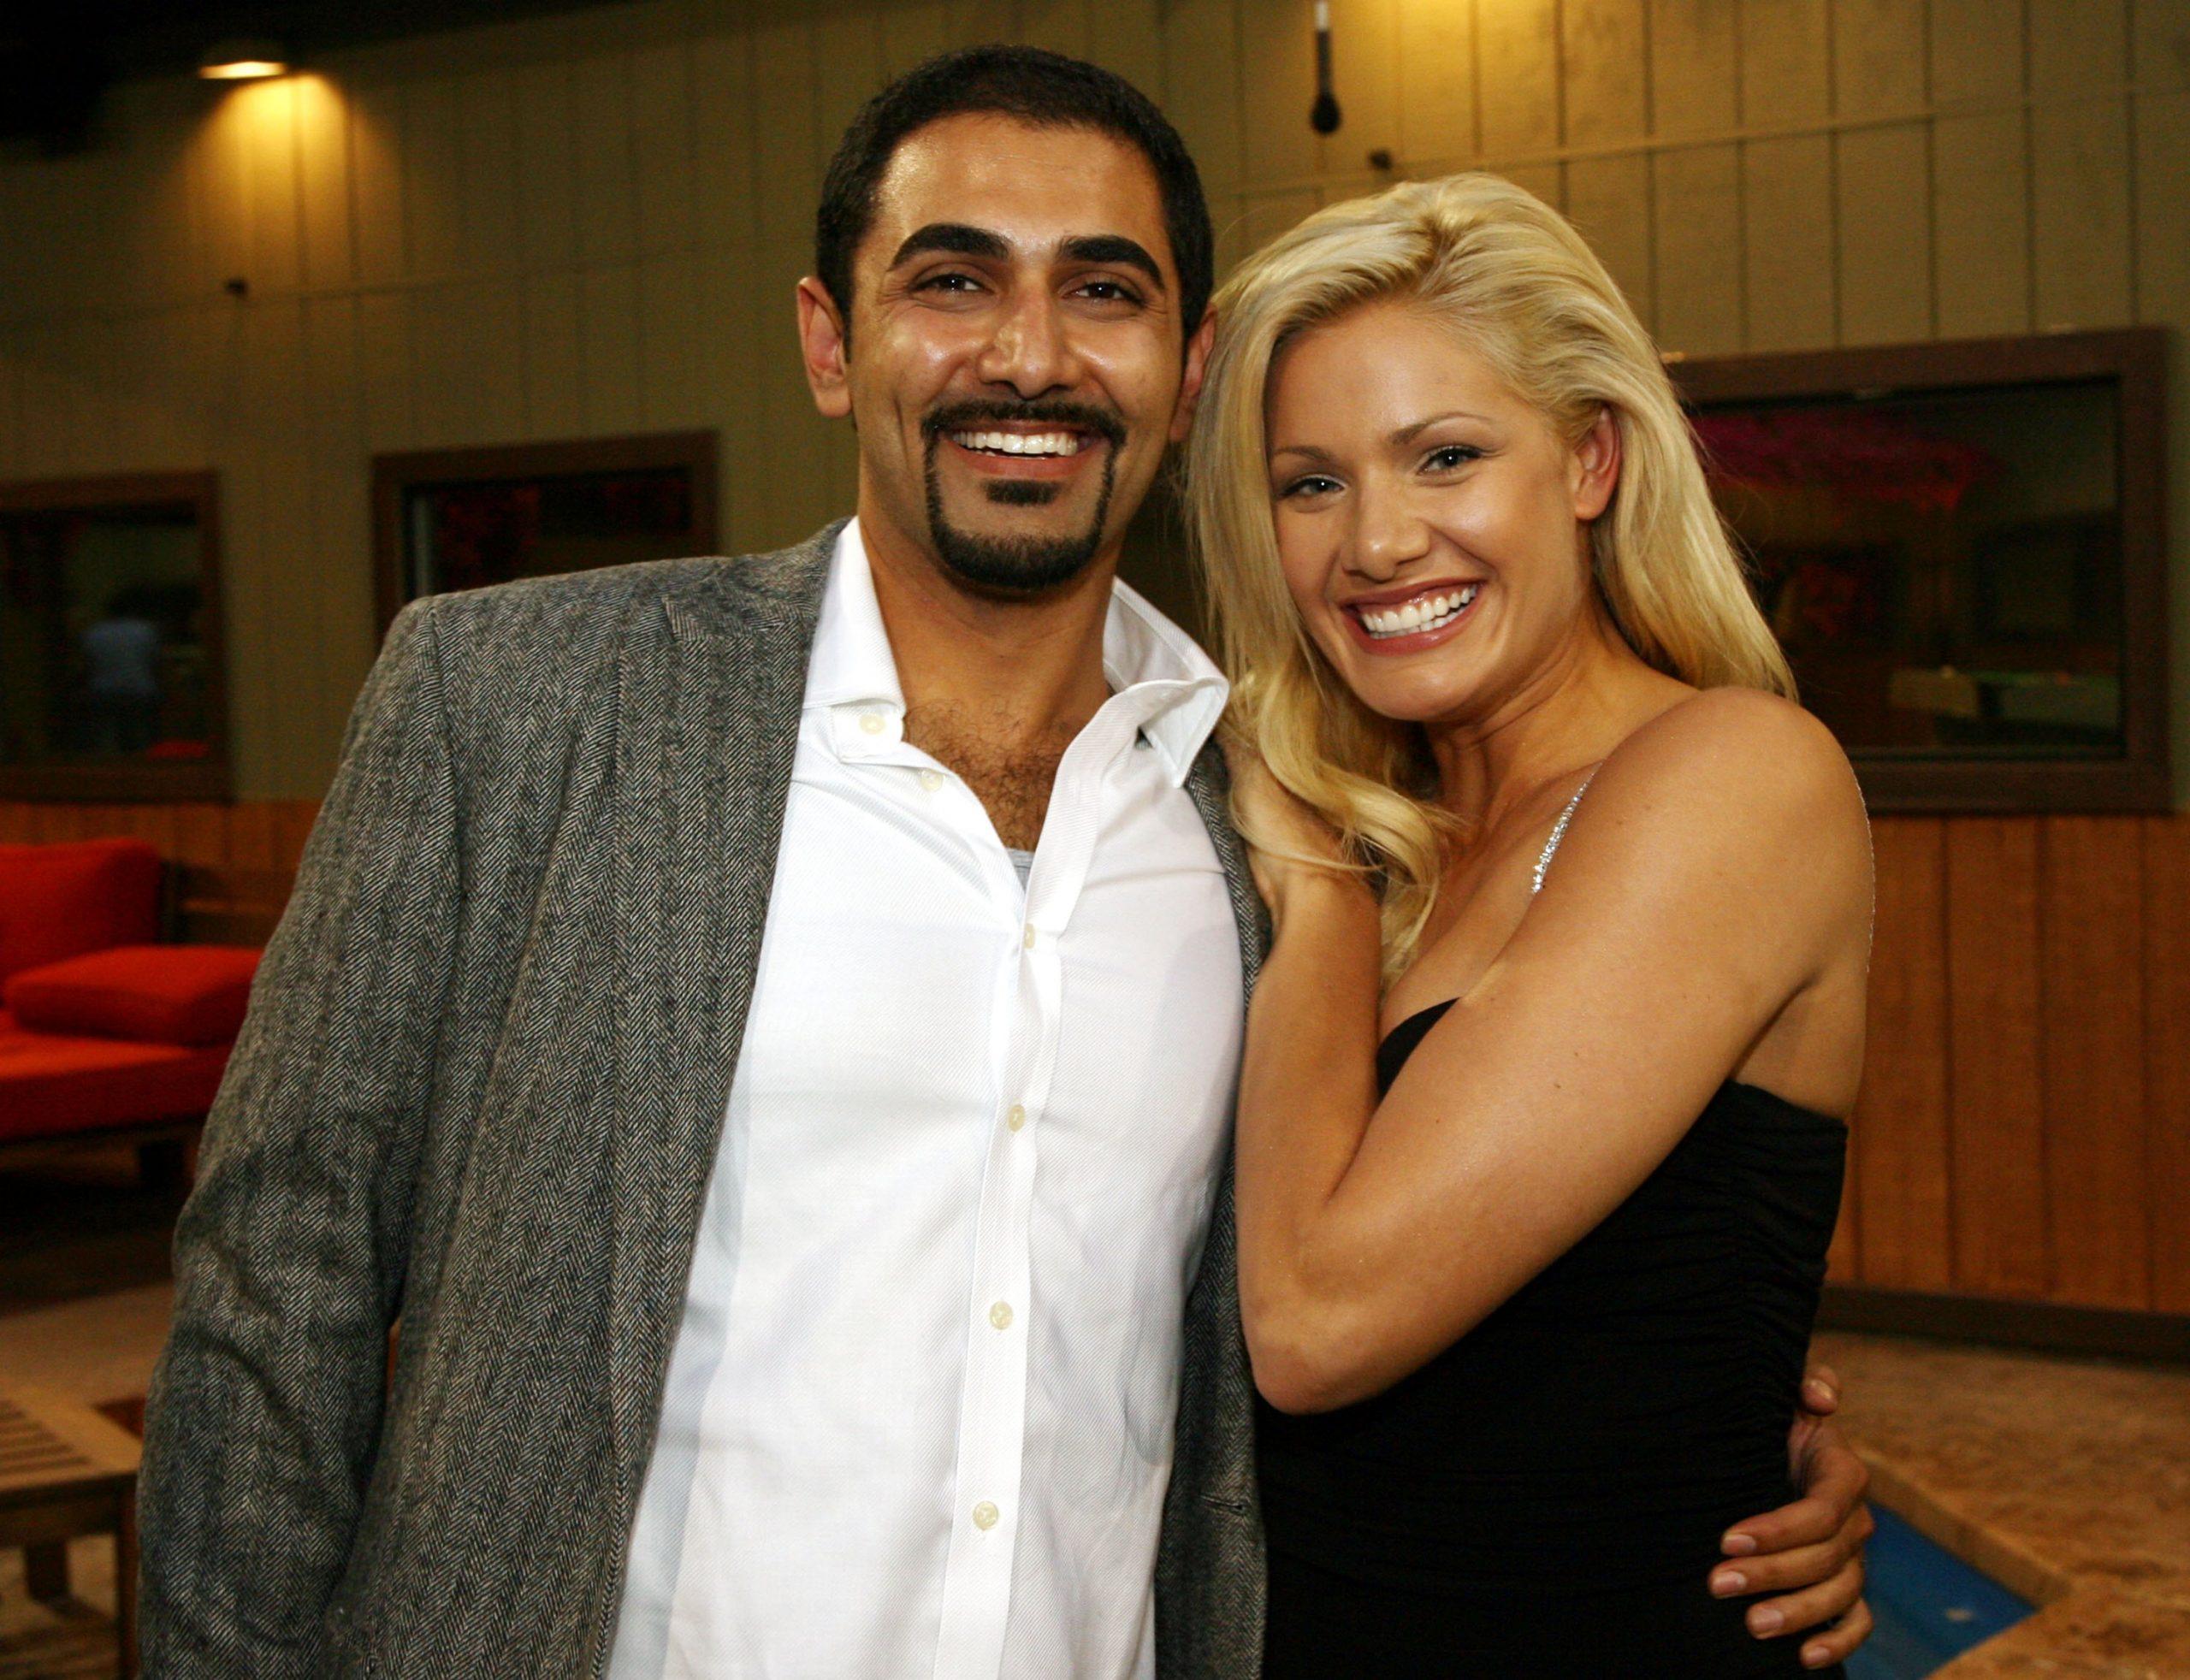 Kaysar Ridha (L) and Janelle Pierzina pose at Big Brother 7: All-Stars